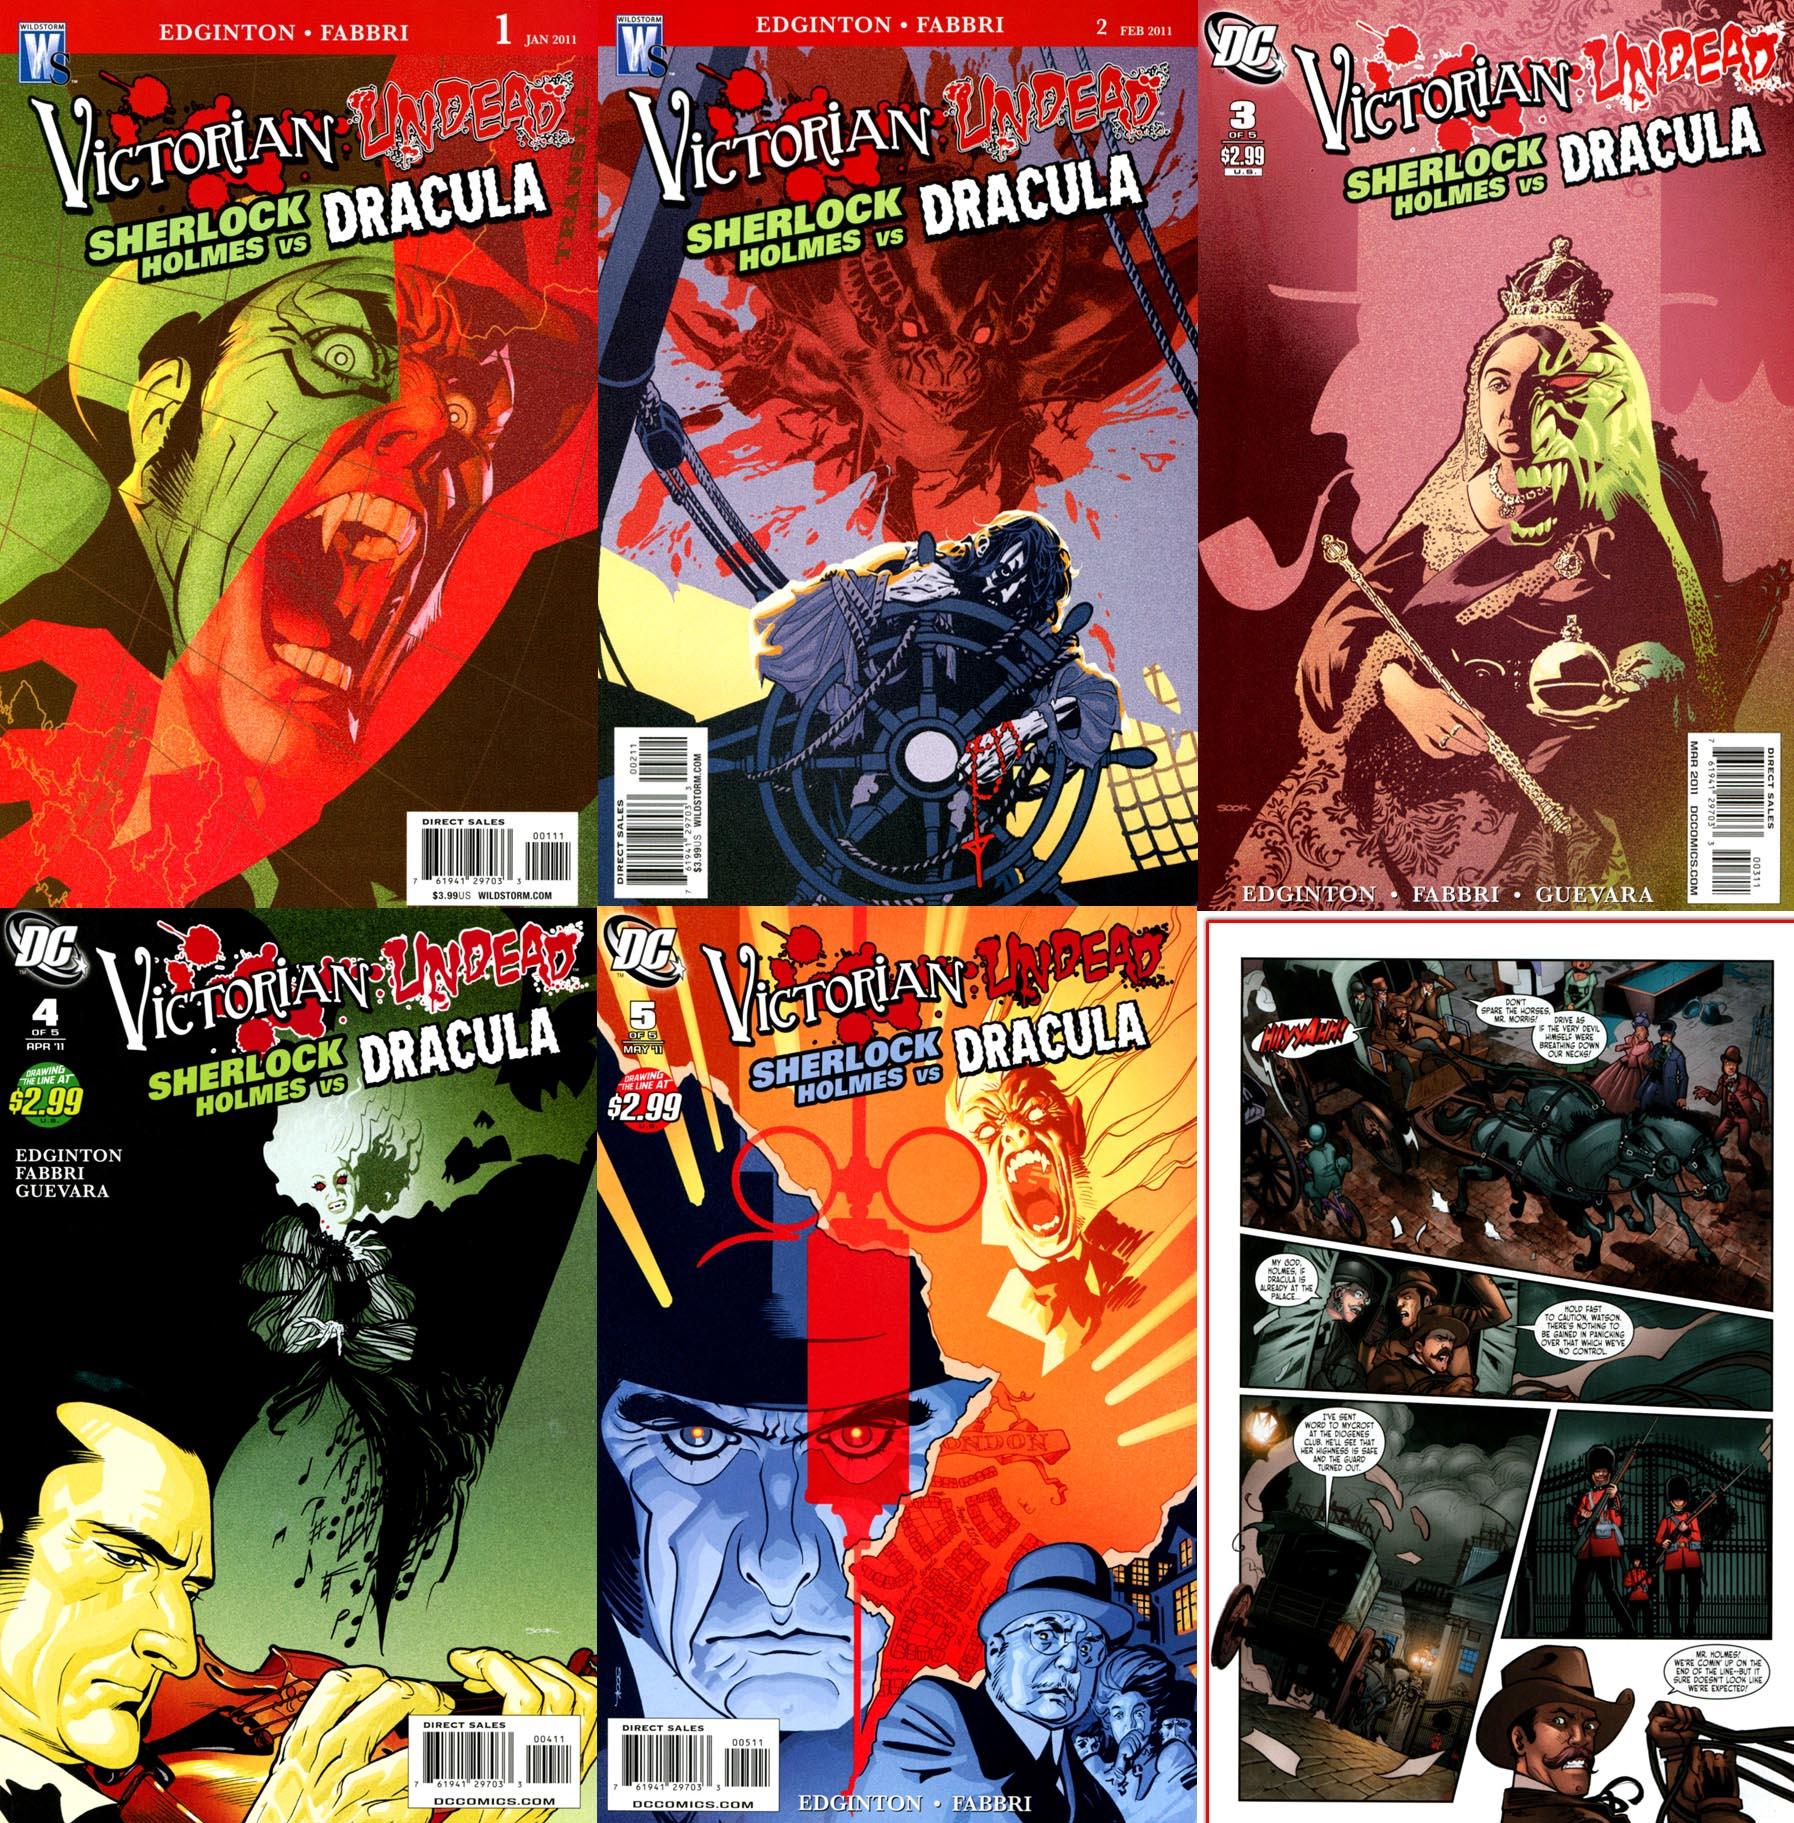 Victorian Undead II: Sherlock Holmes vs. Dracula #1-5 (of 5) (2011)